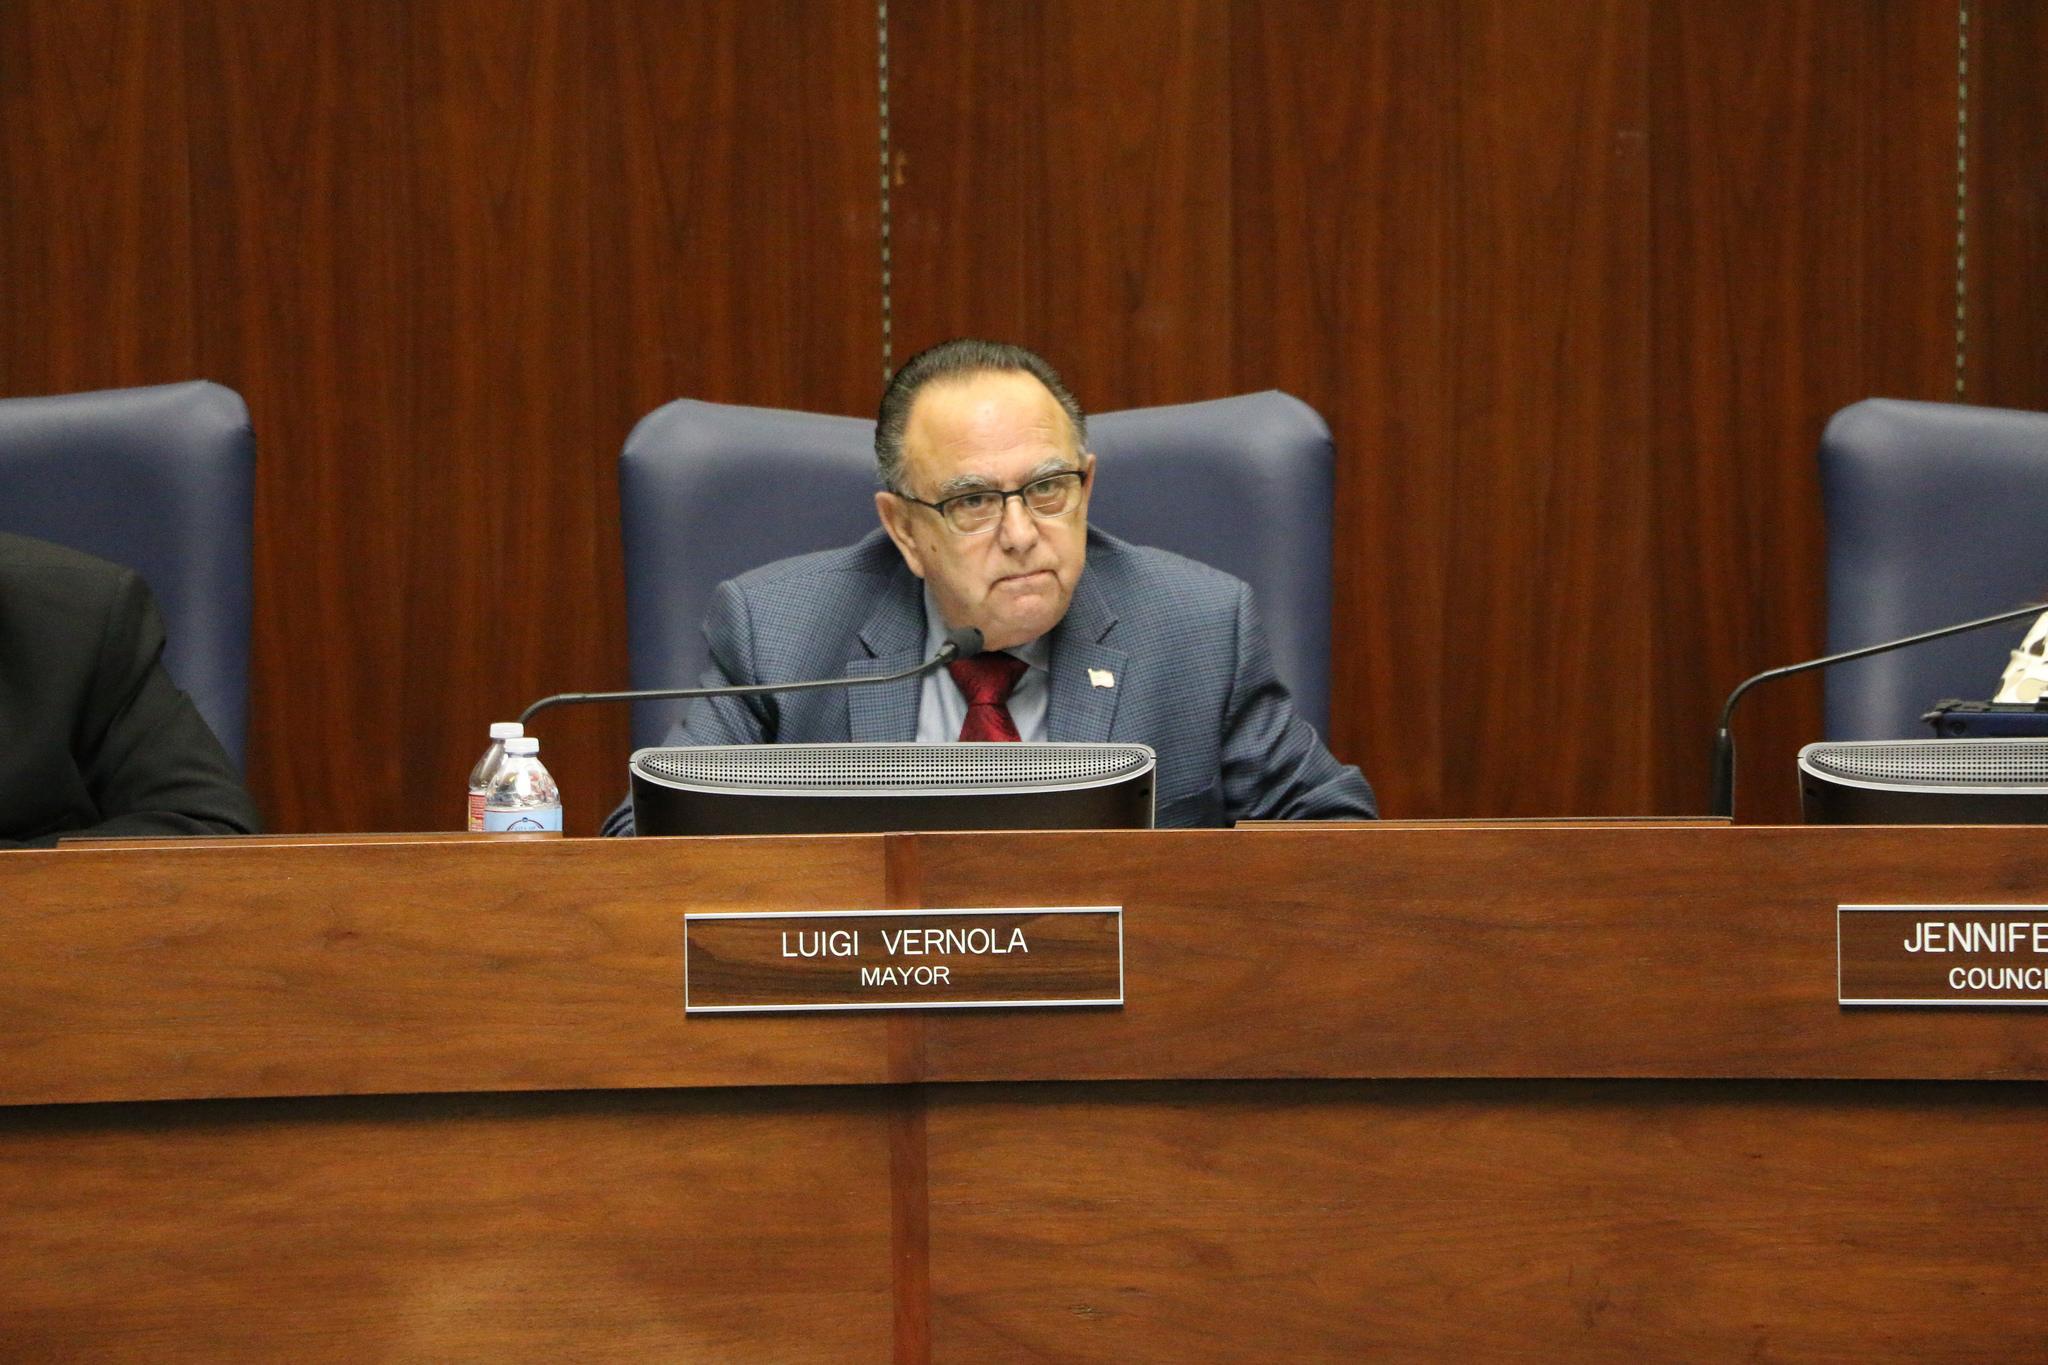 Norwalk mayor Luigi Vernola. City of Norwalk photo